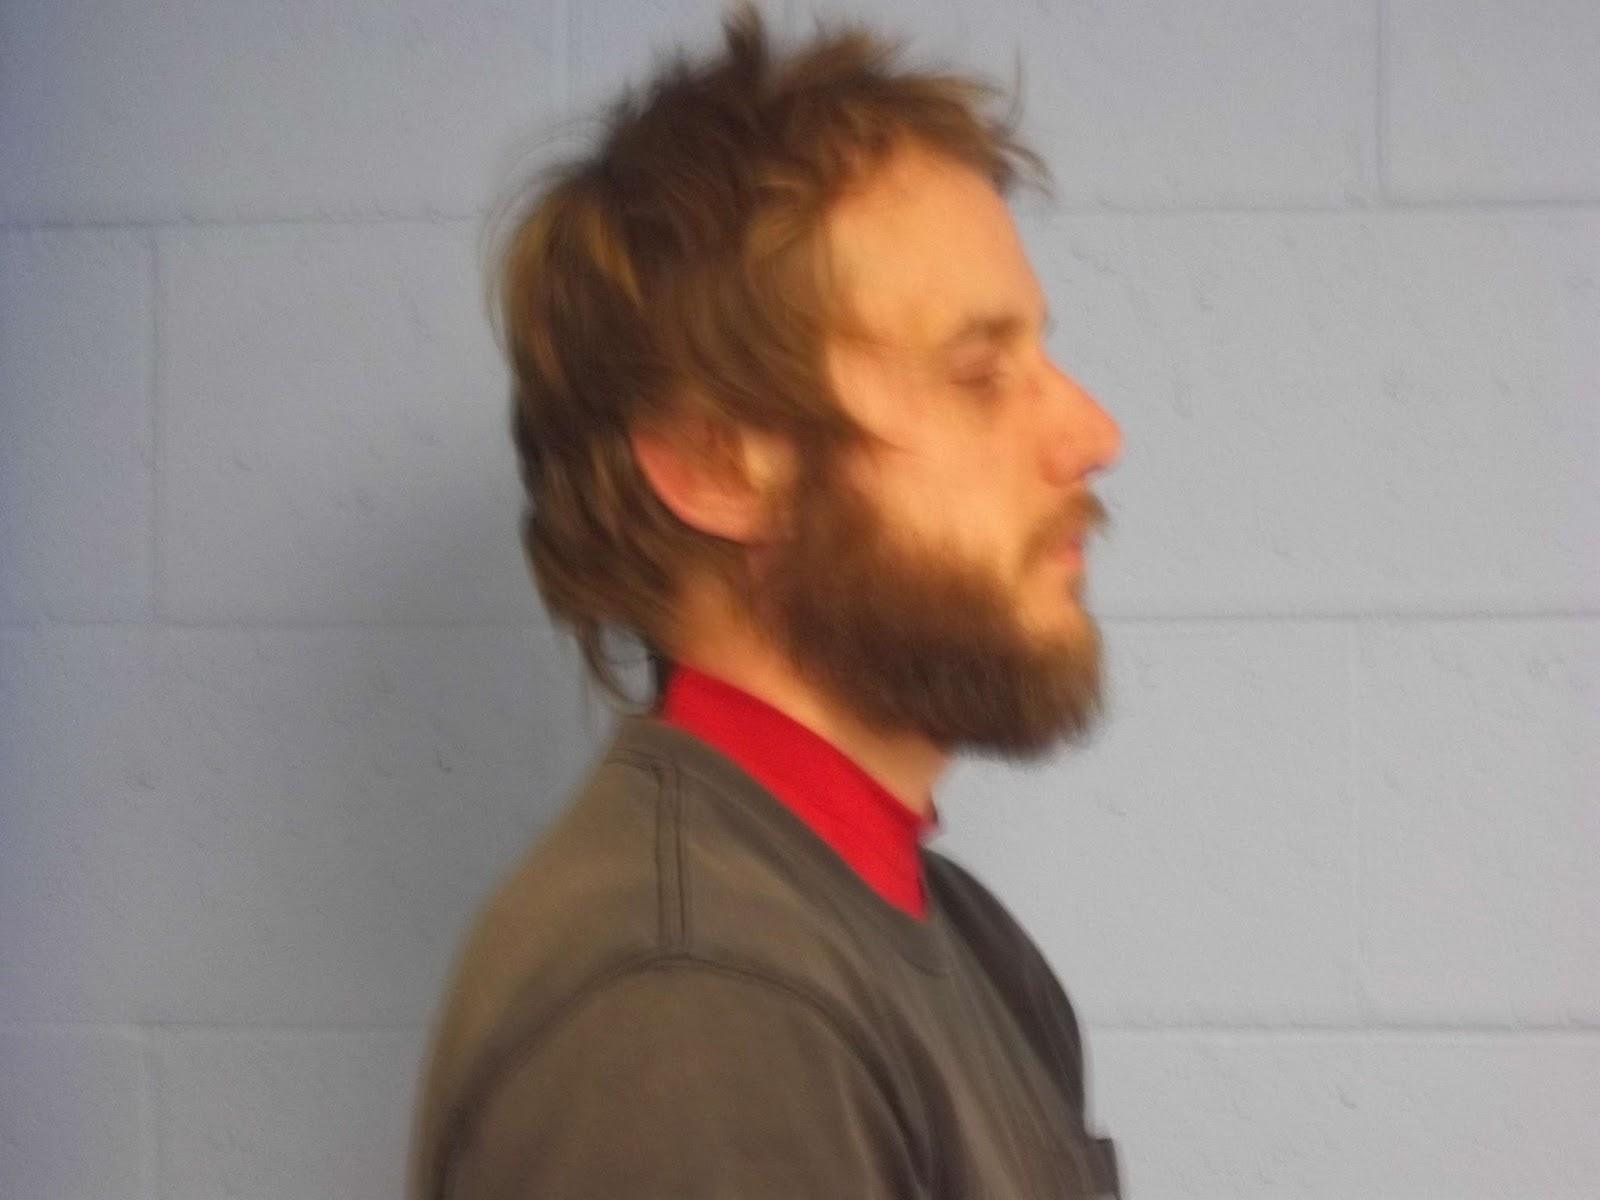 Effingham Resident Arrested for Transporting Drugs